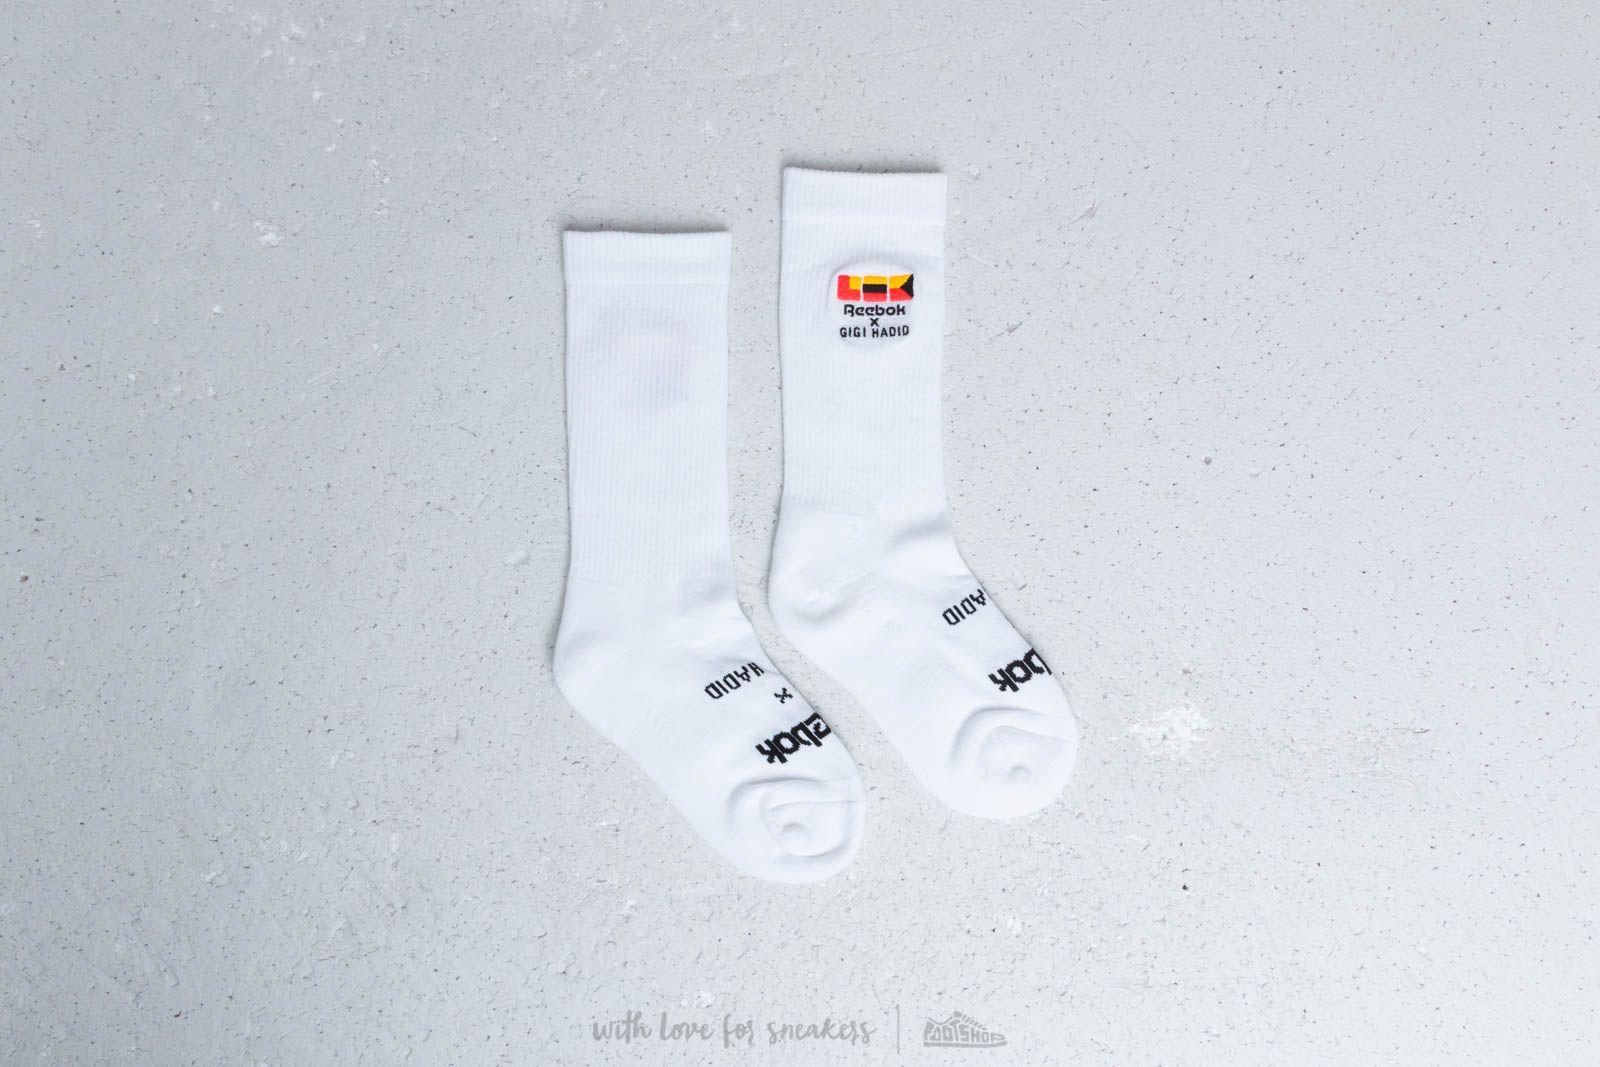 Reebok x Gigi Hadid Socks